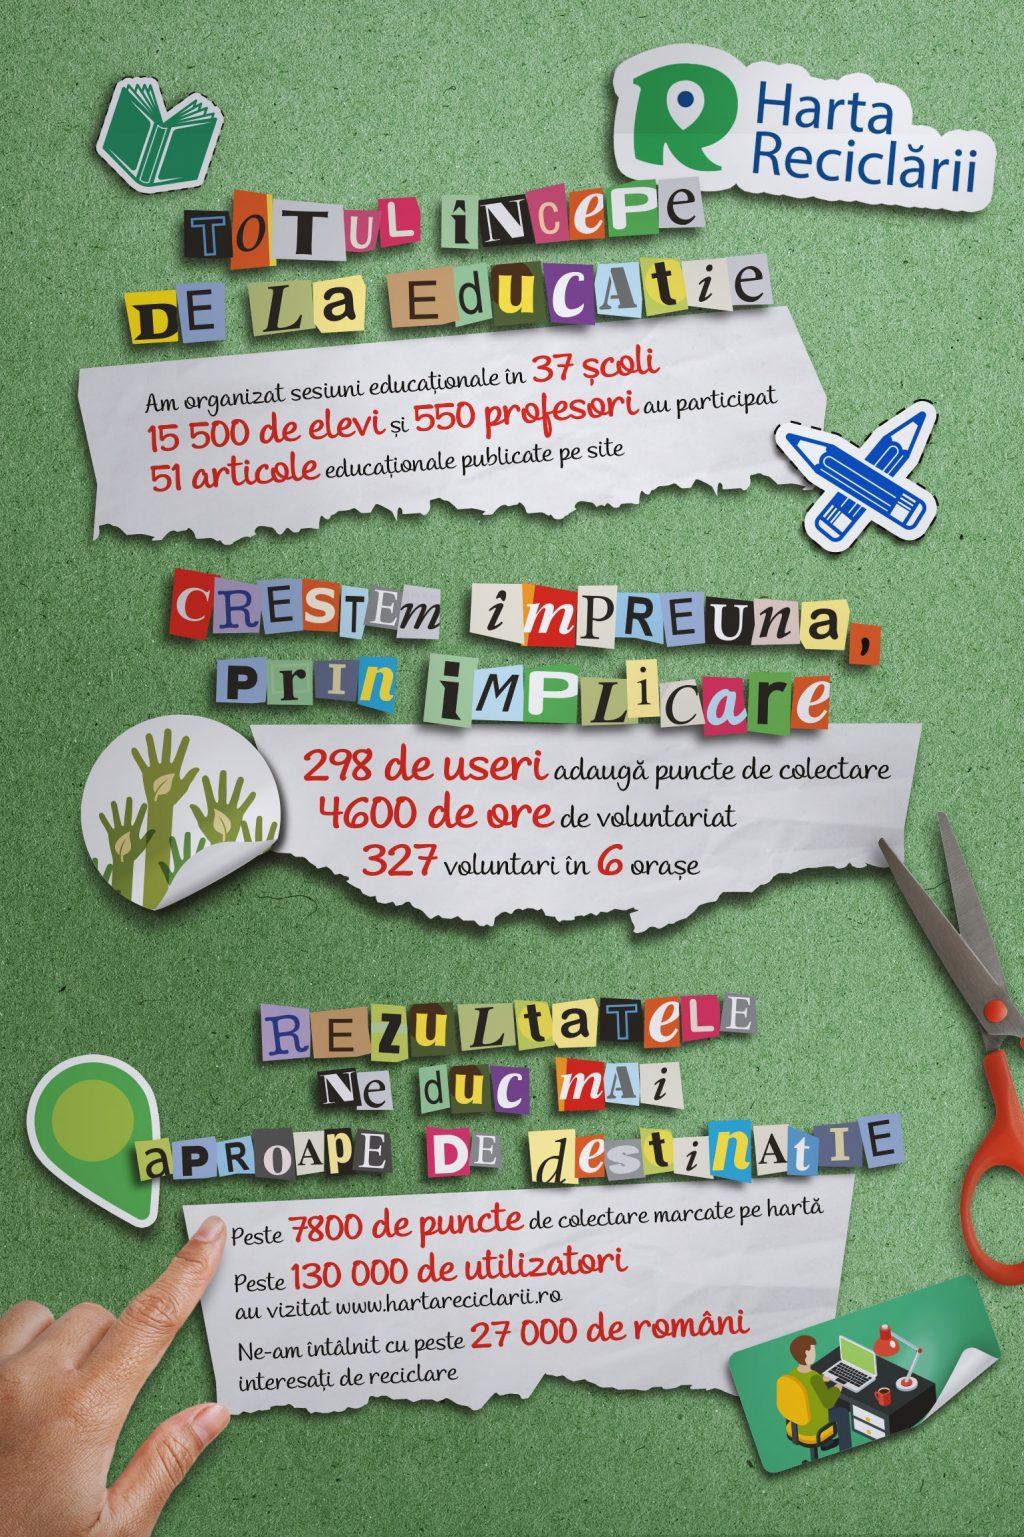 Harta Reciclarii